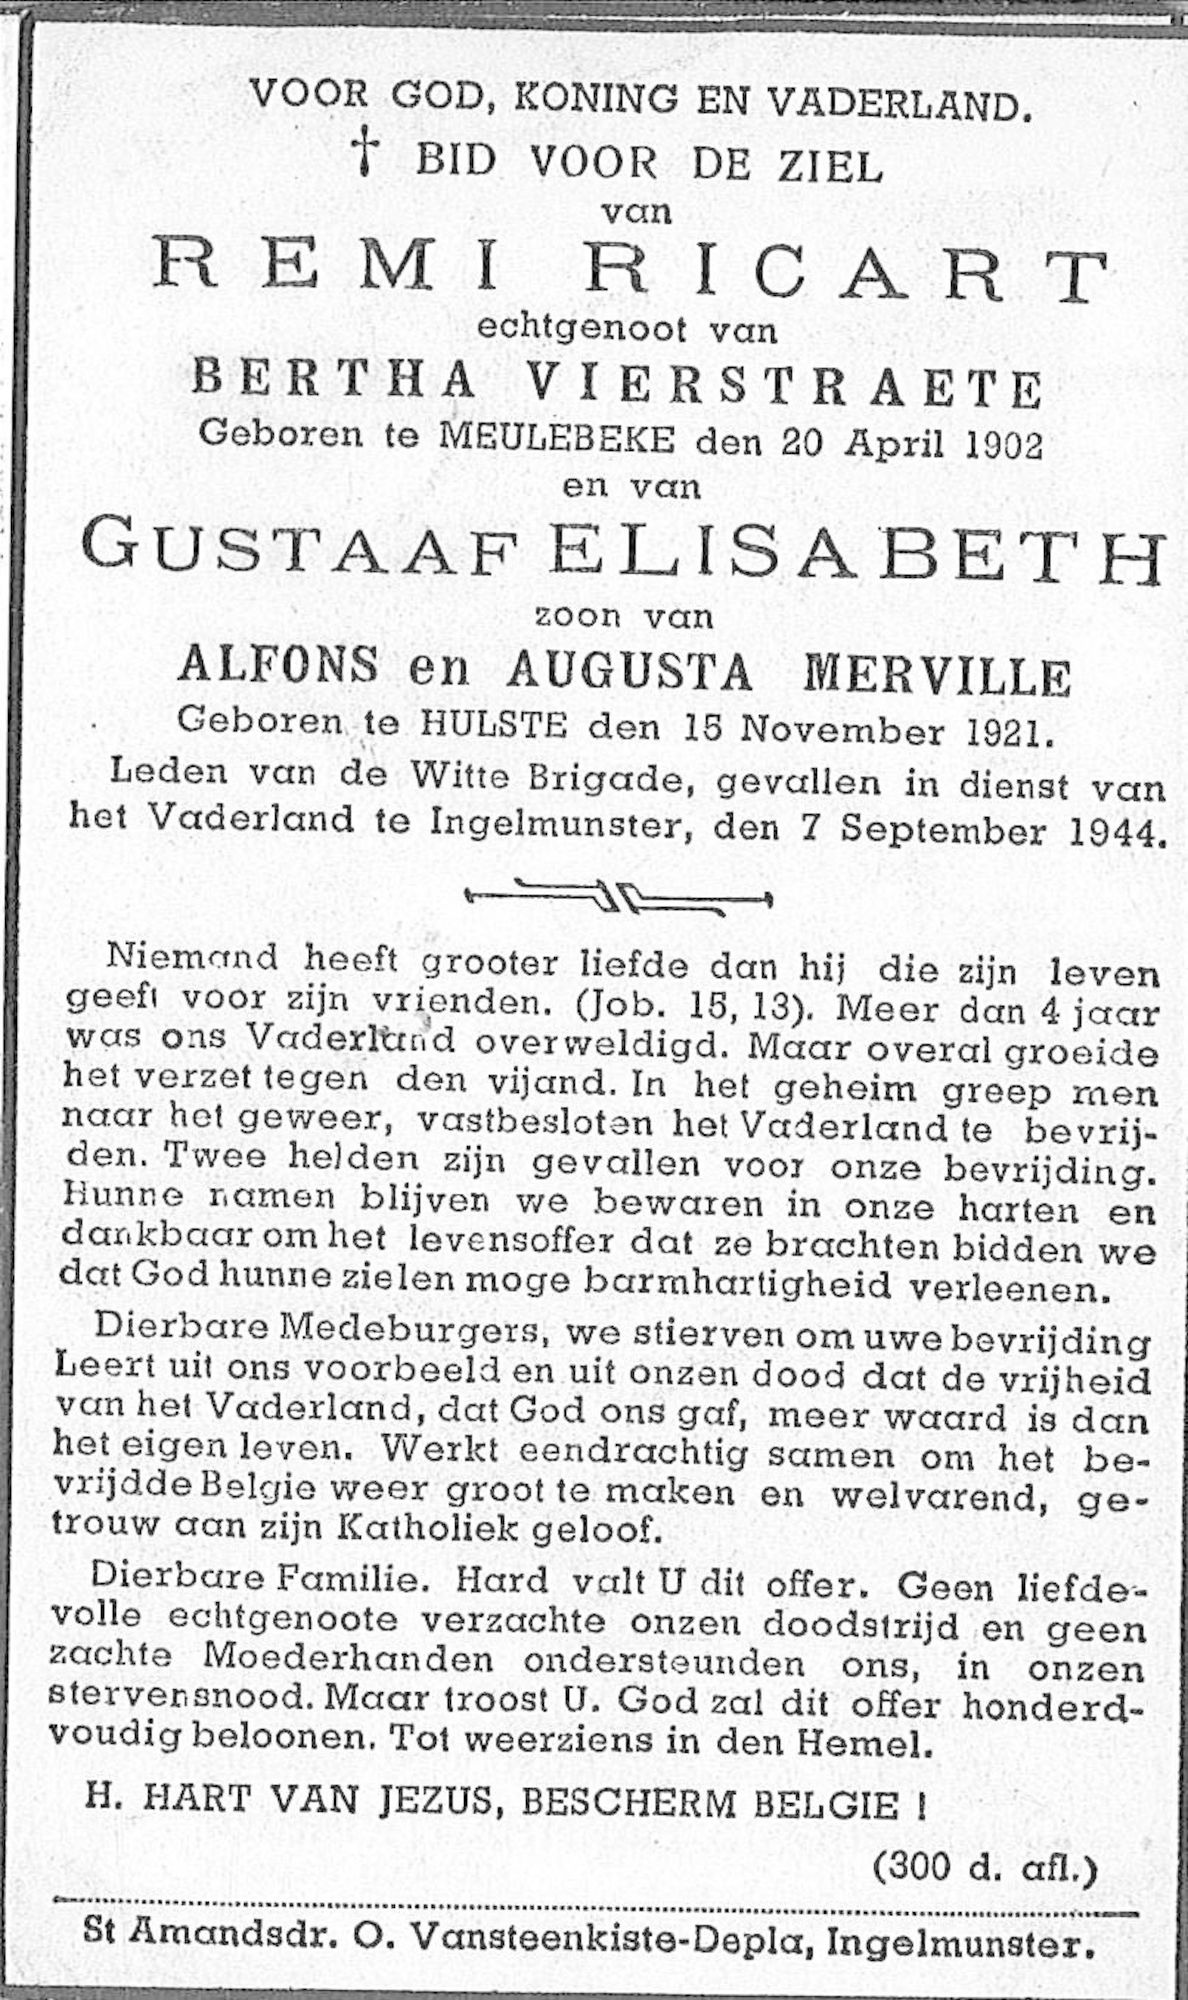 Gustaaf Elisabeth